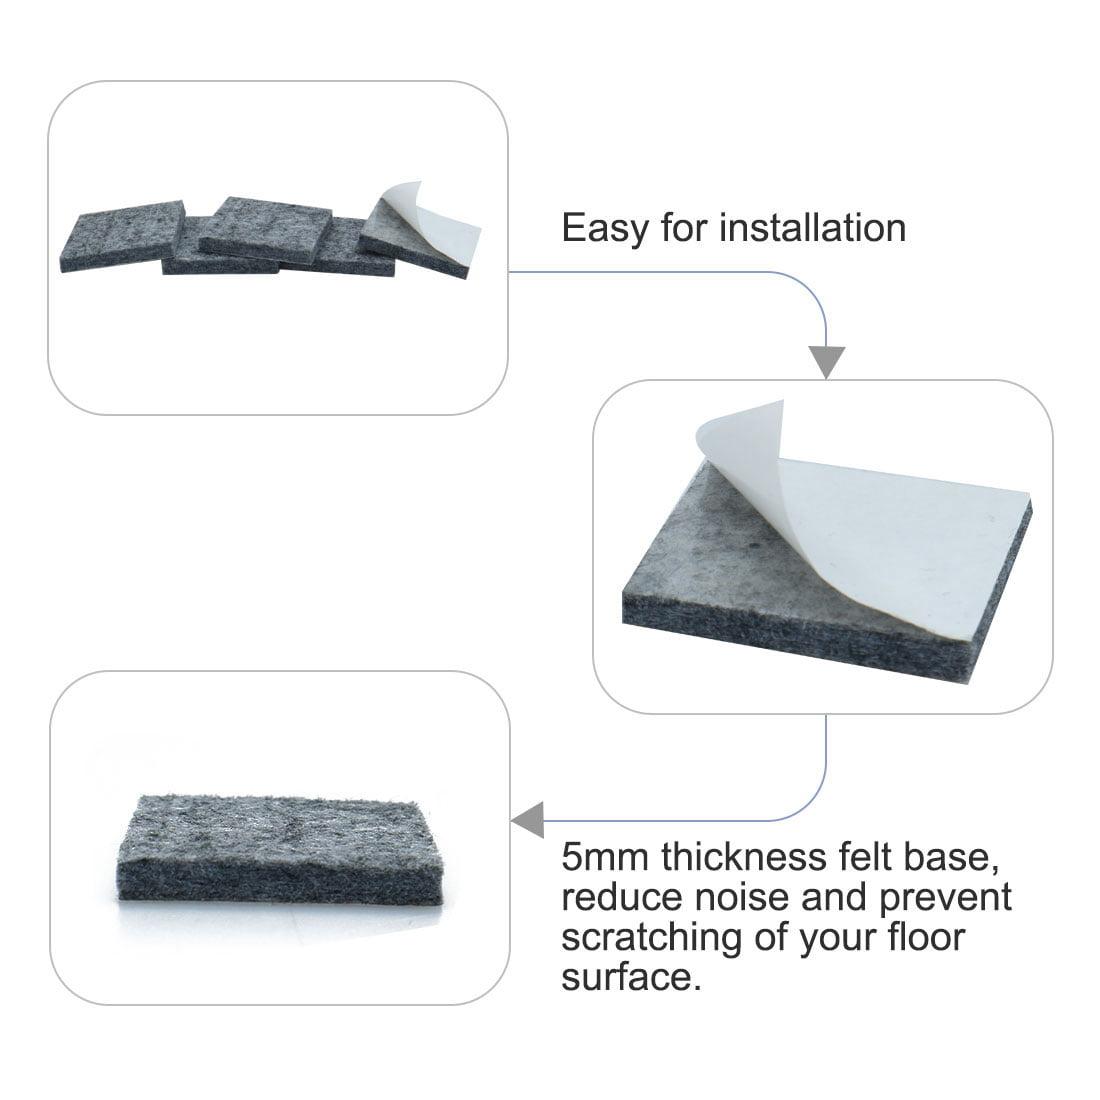 Felt Furniture Pad Self Adhesive Anti-scratch for Floor Protector Grey 86pcs - image 5 de 7